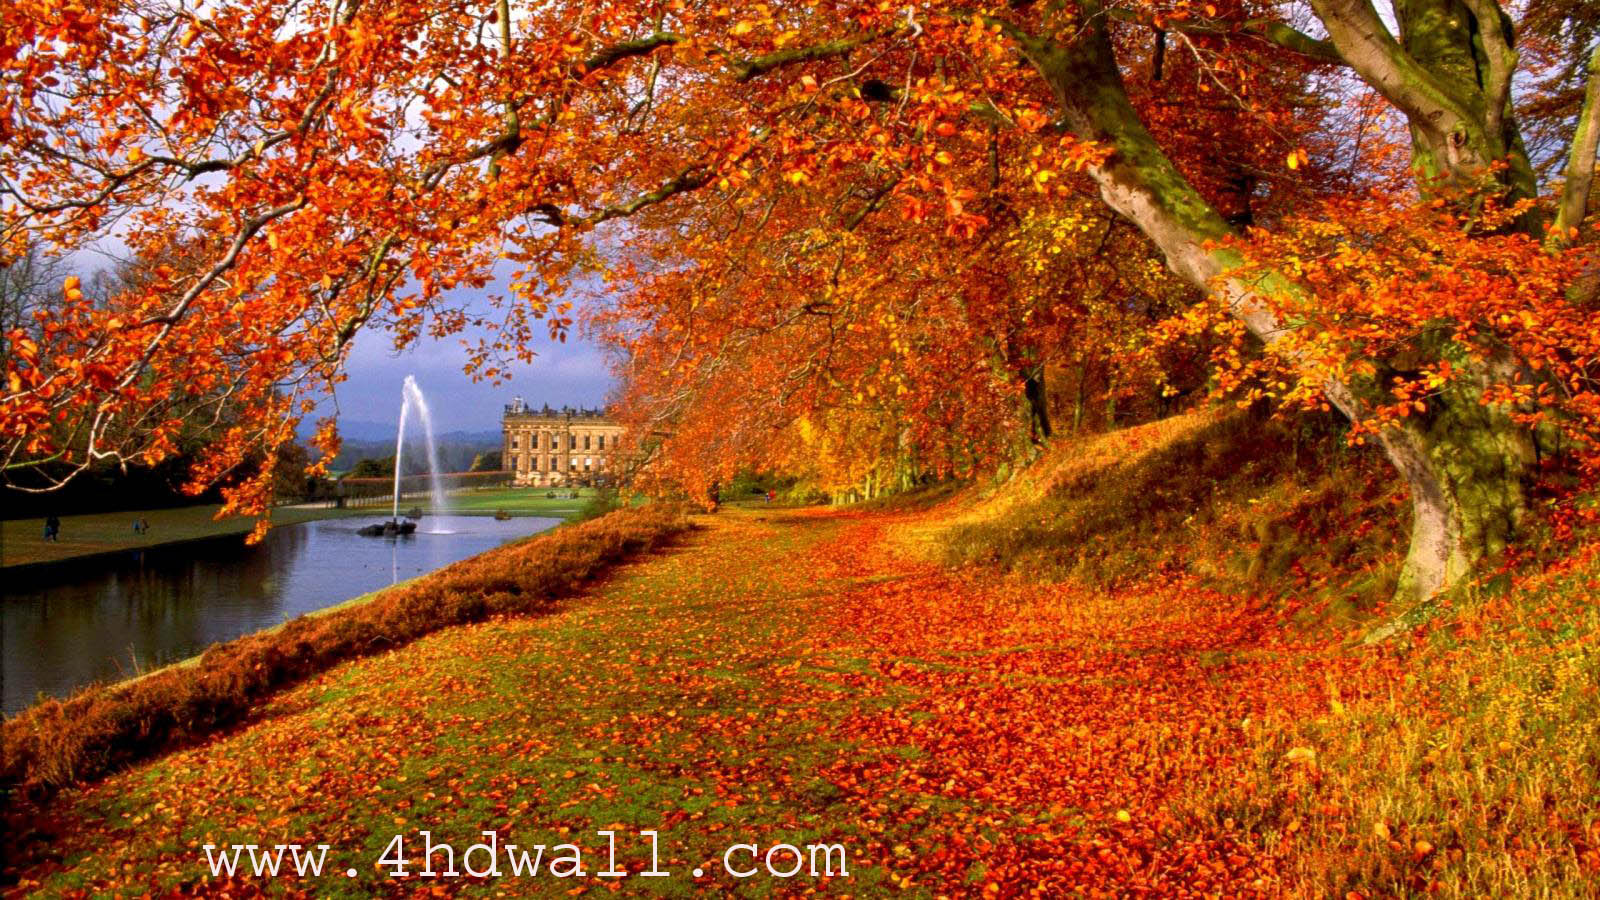 Fall - Autumn Hd 1600 X 900 , HD Wallpaper & Backgrounds